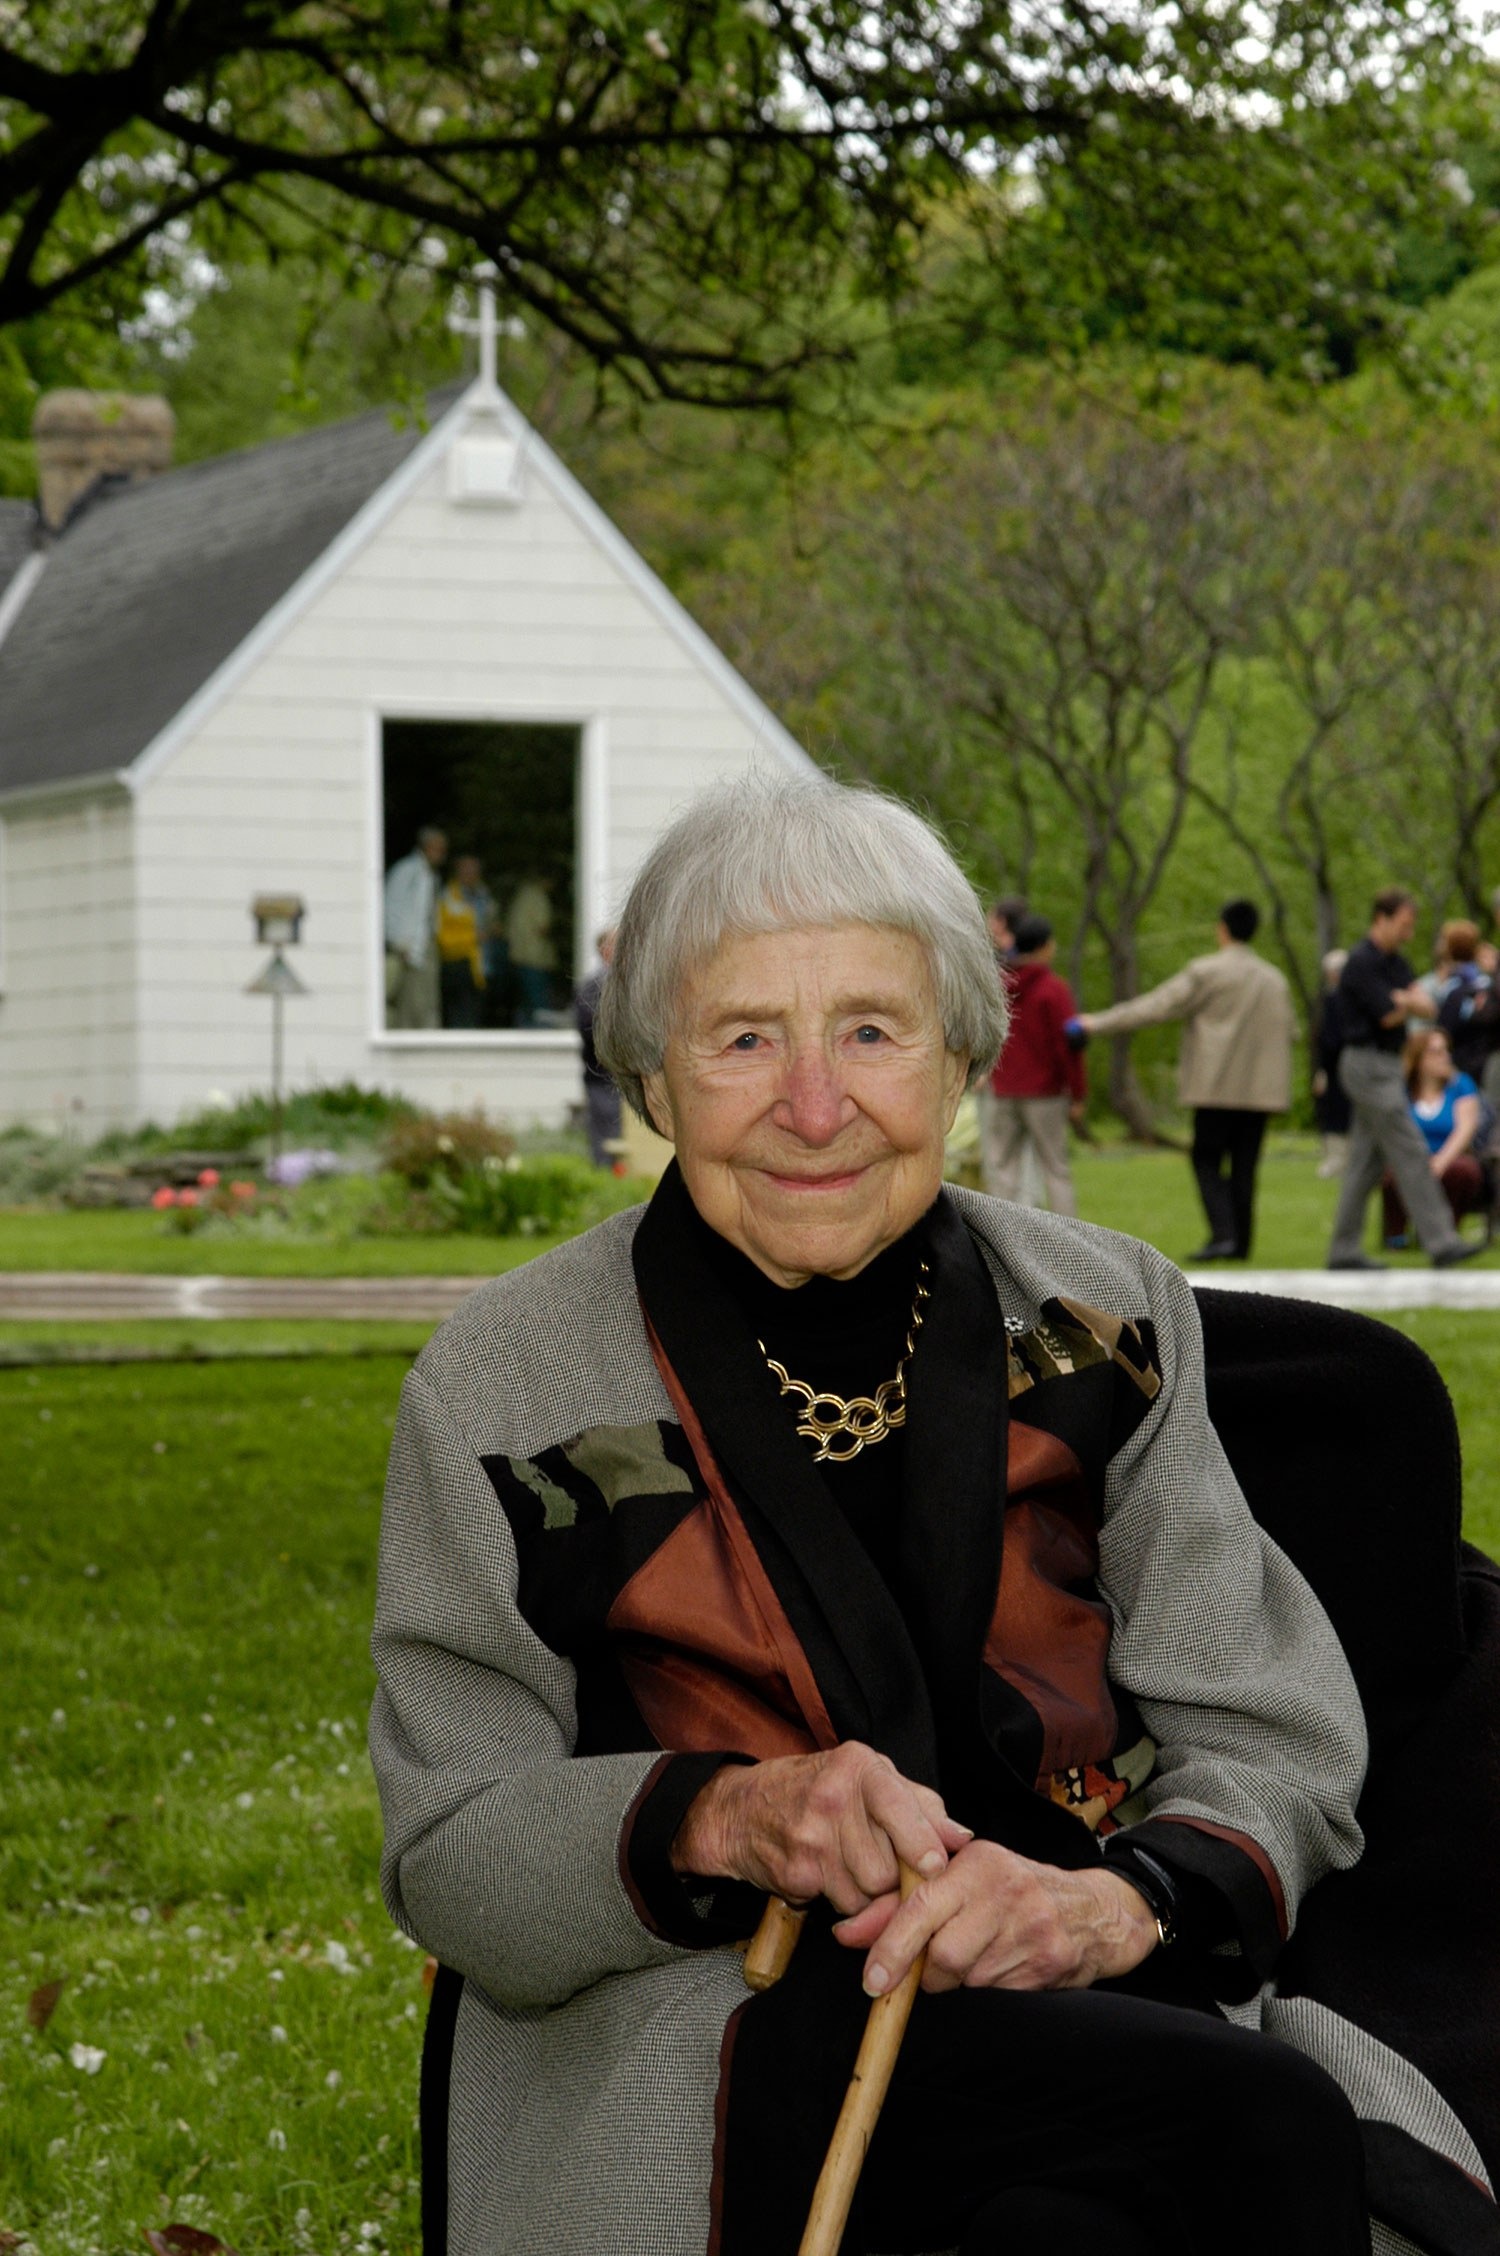 Doris McCarthy 1910-2010 (Photo: David Lee)